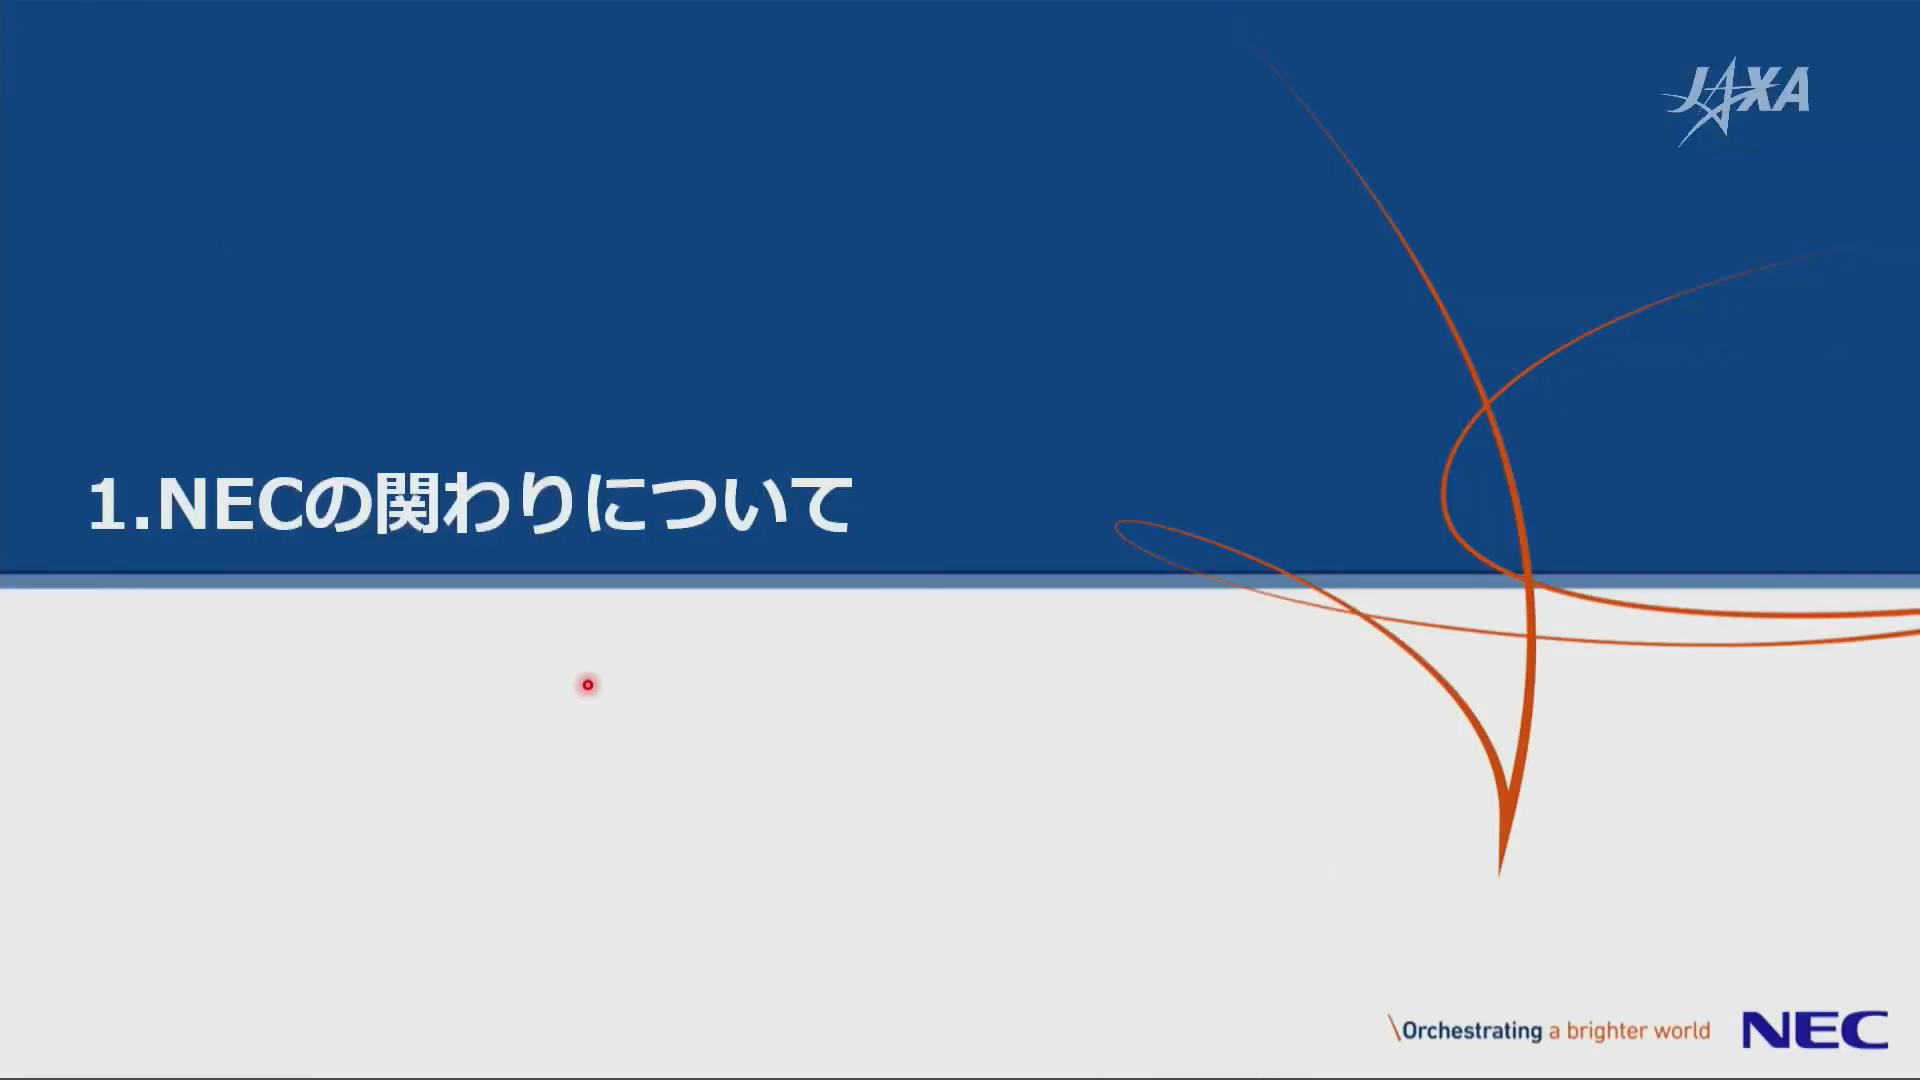 f:id:Imamura:20191219211807p:plain